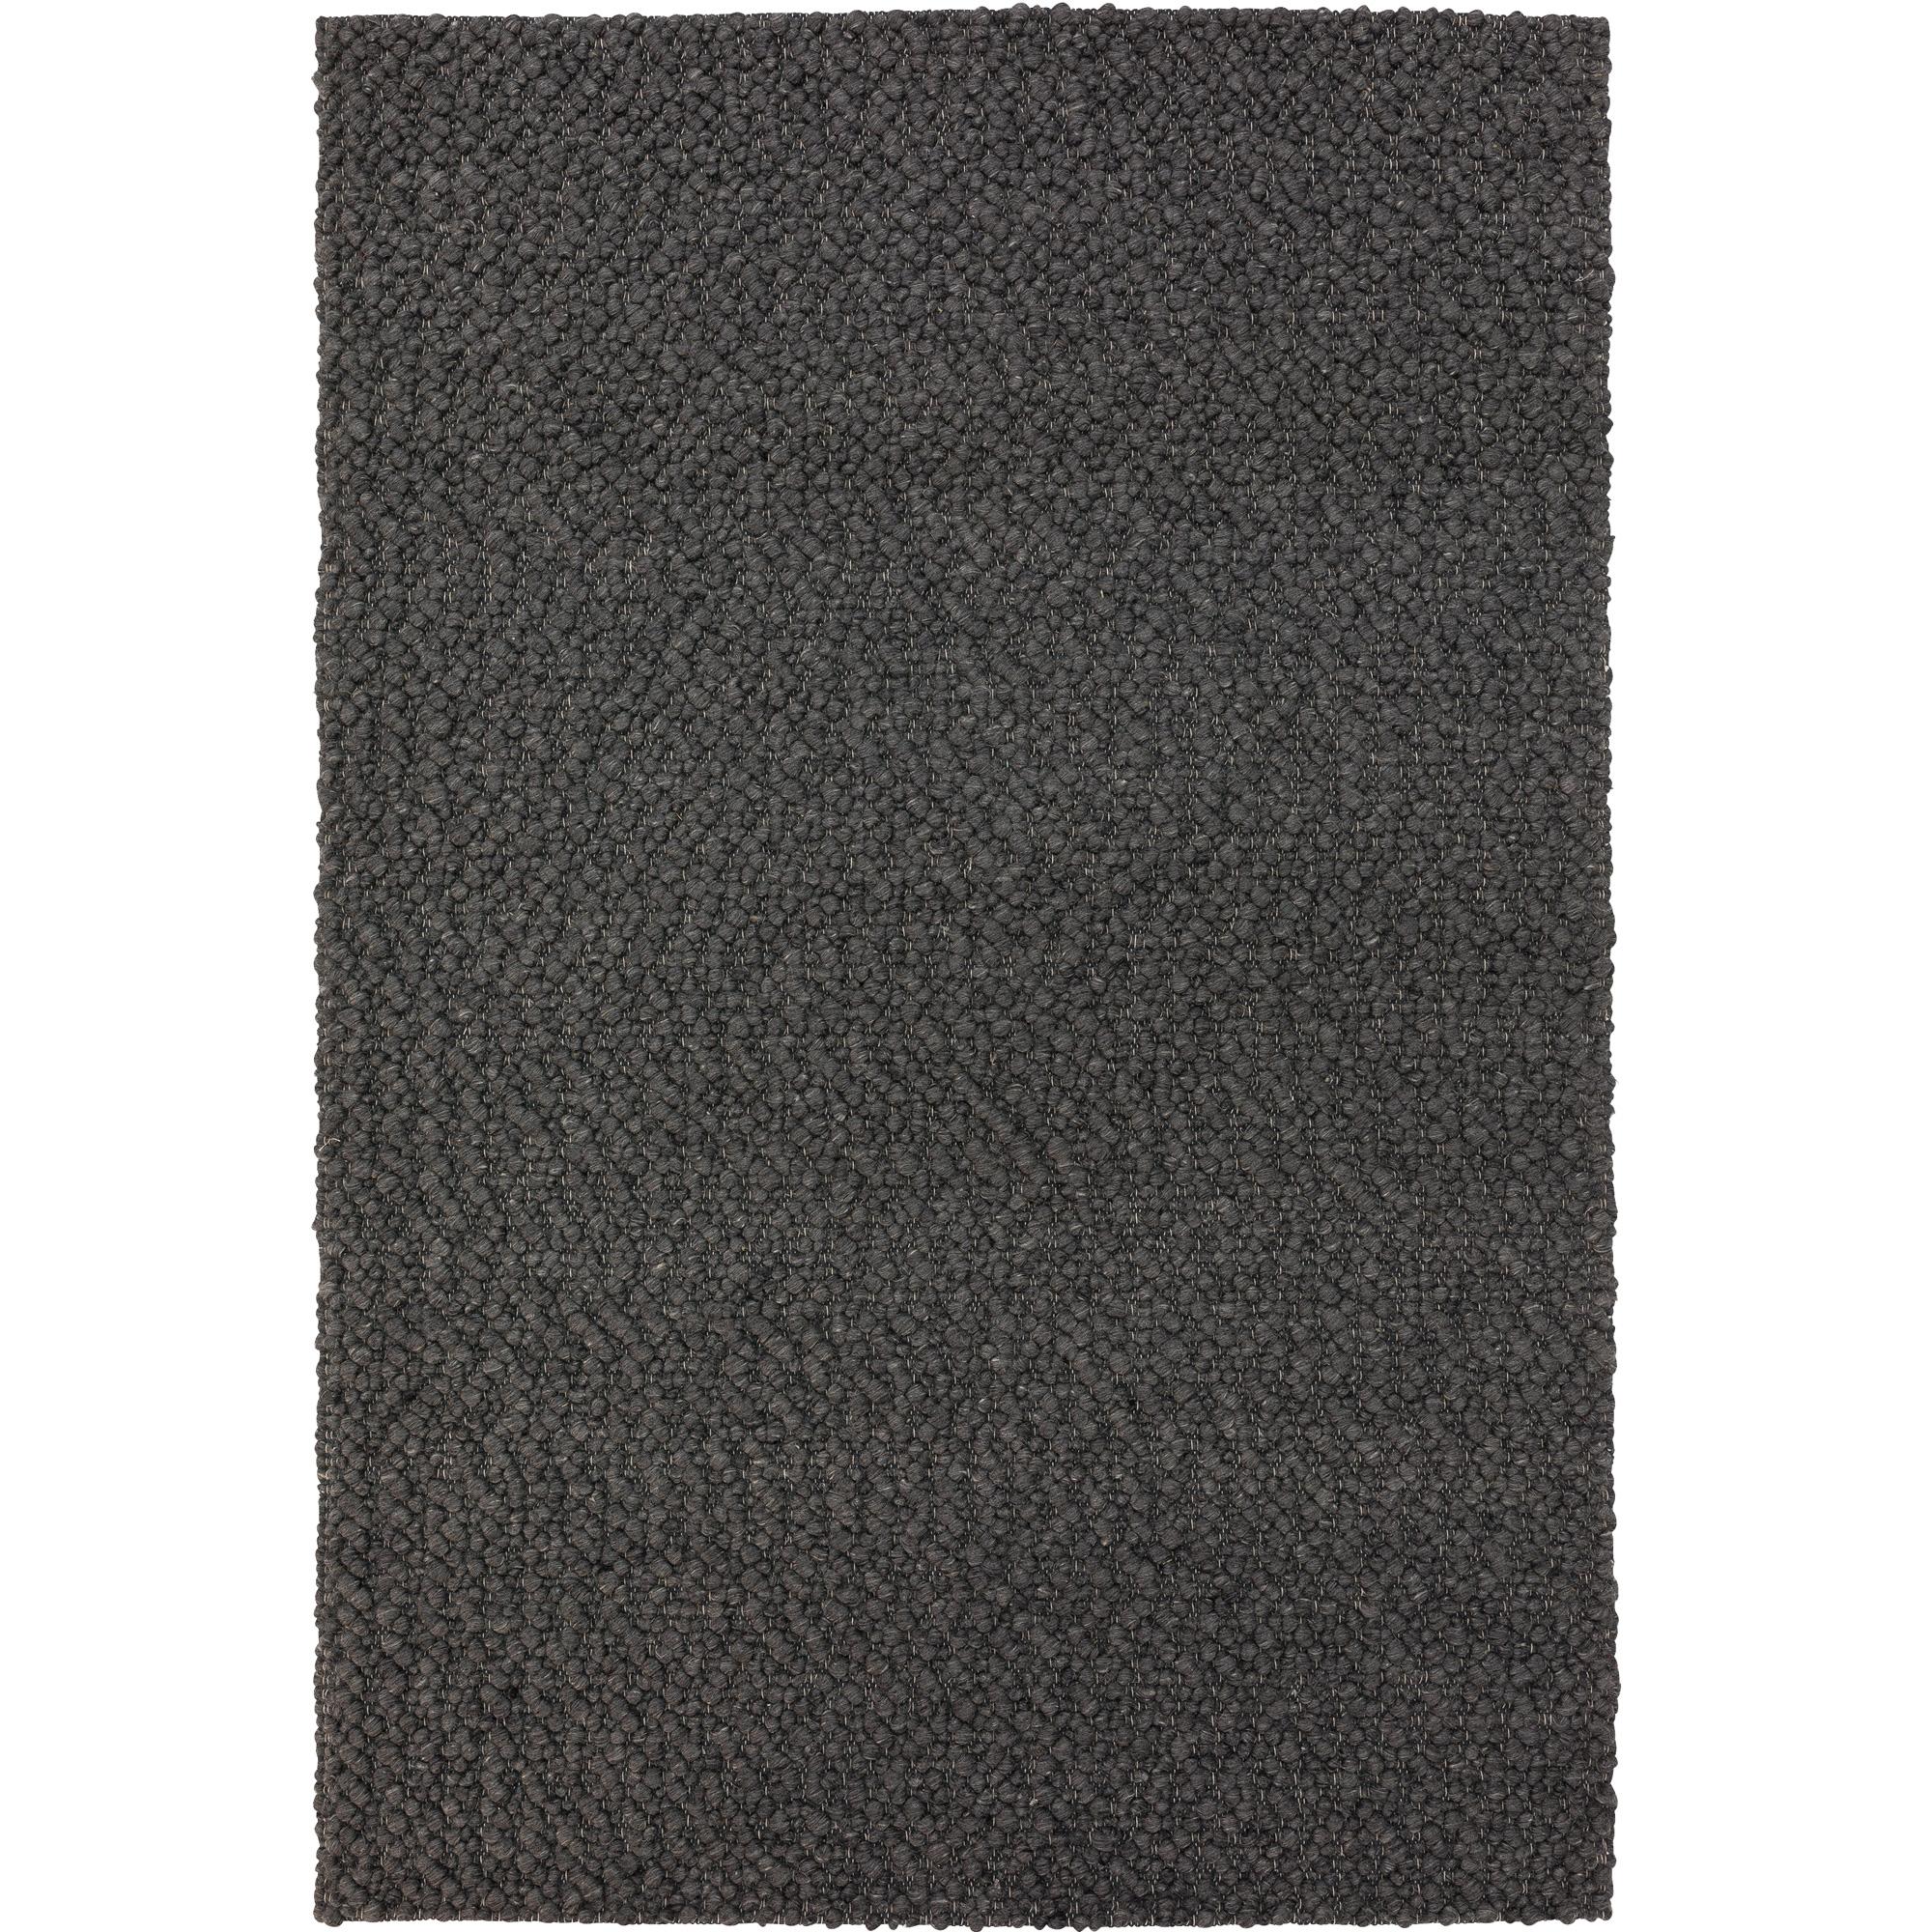 Dalyn Rug Company | Gorbea Charcoal 5x8 Area Rug